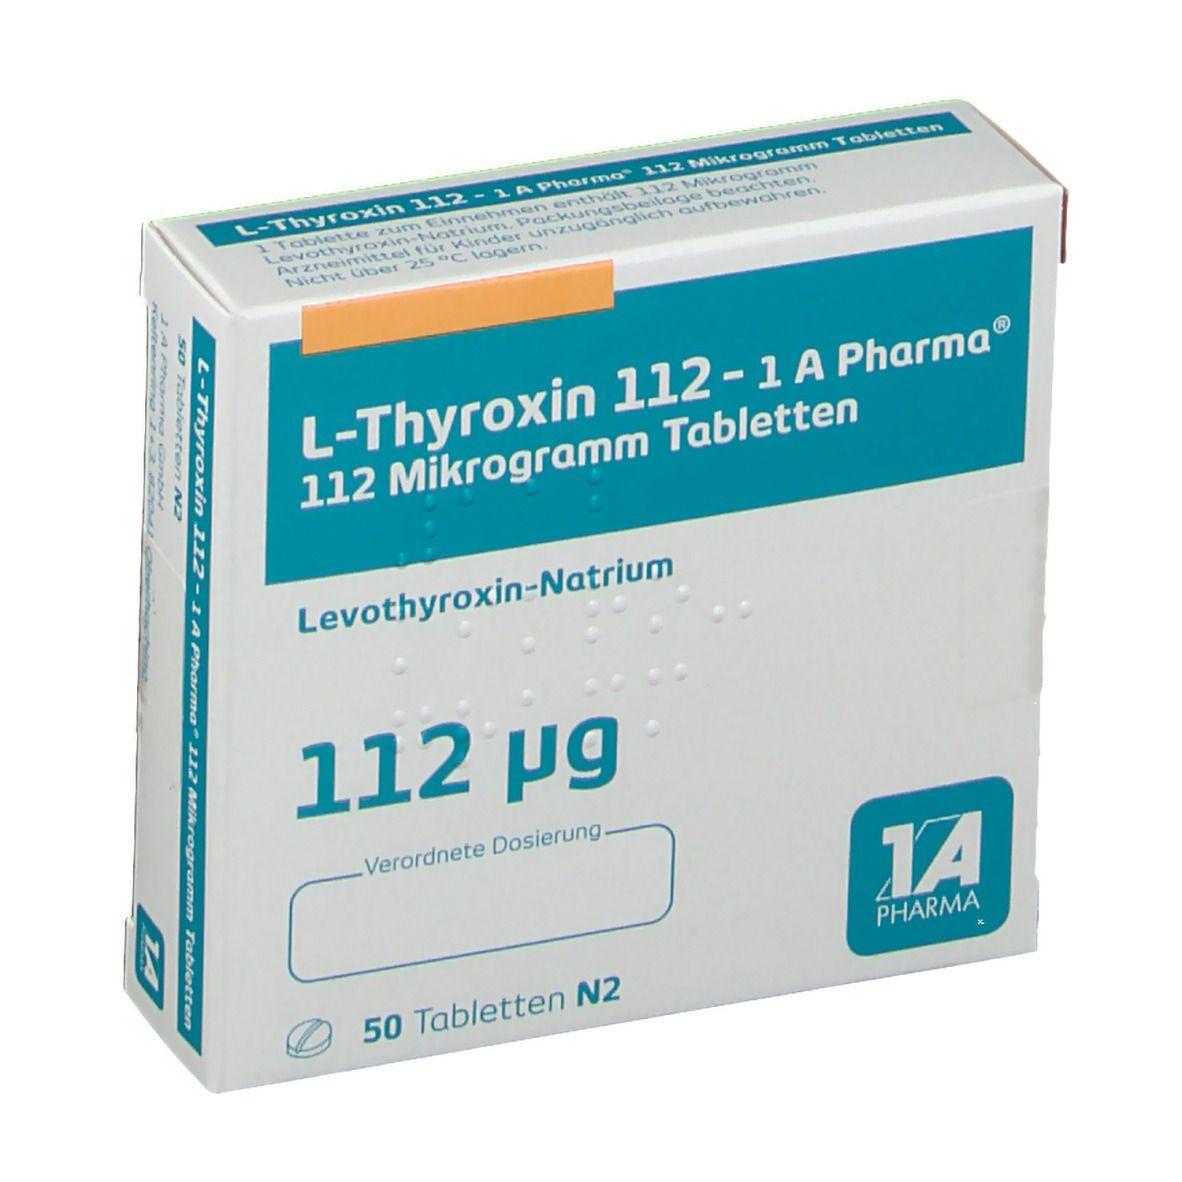 L-Thyroxin 112 1a Pharma Erfahrungen